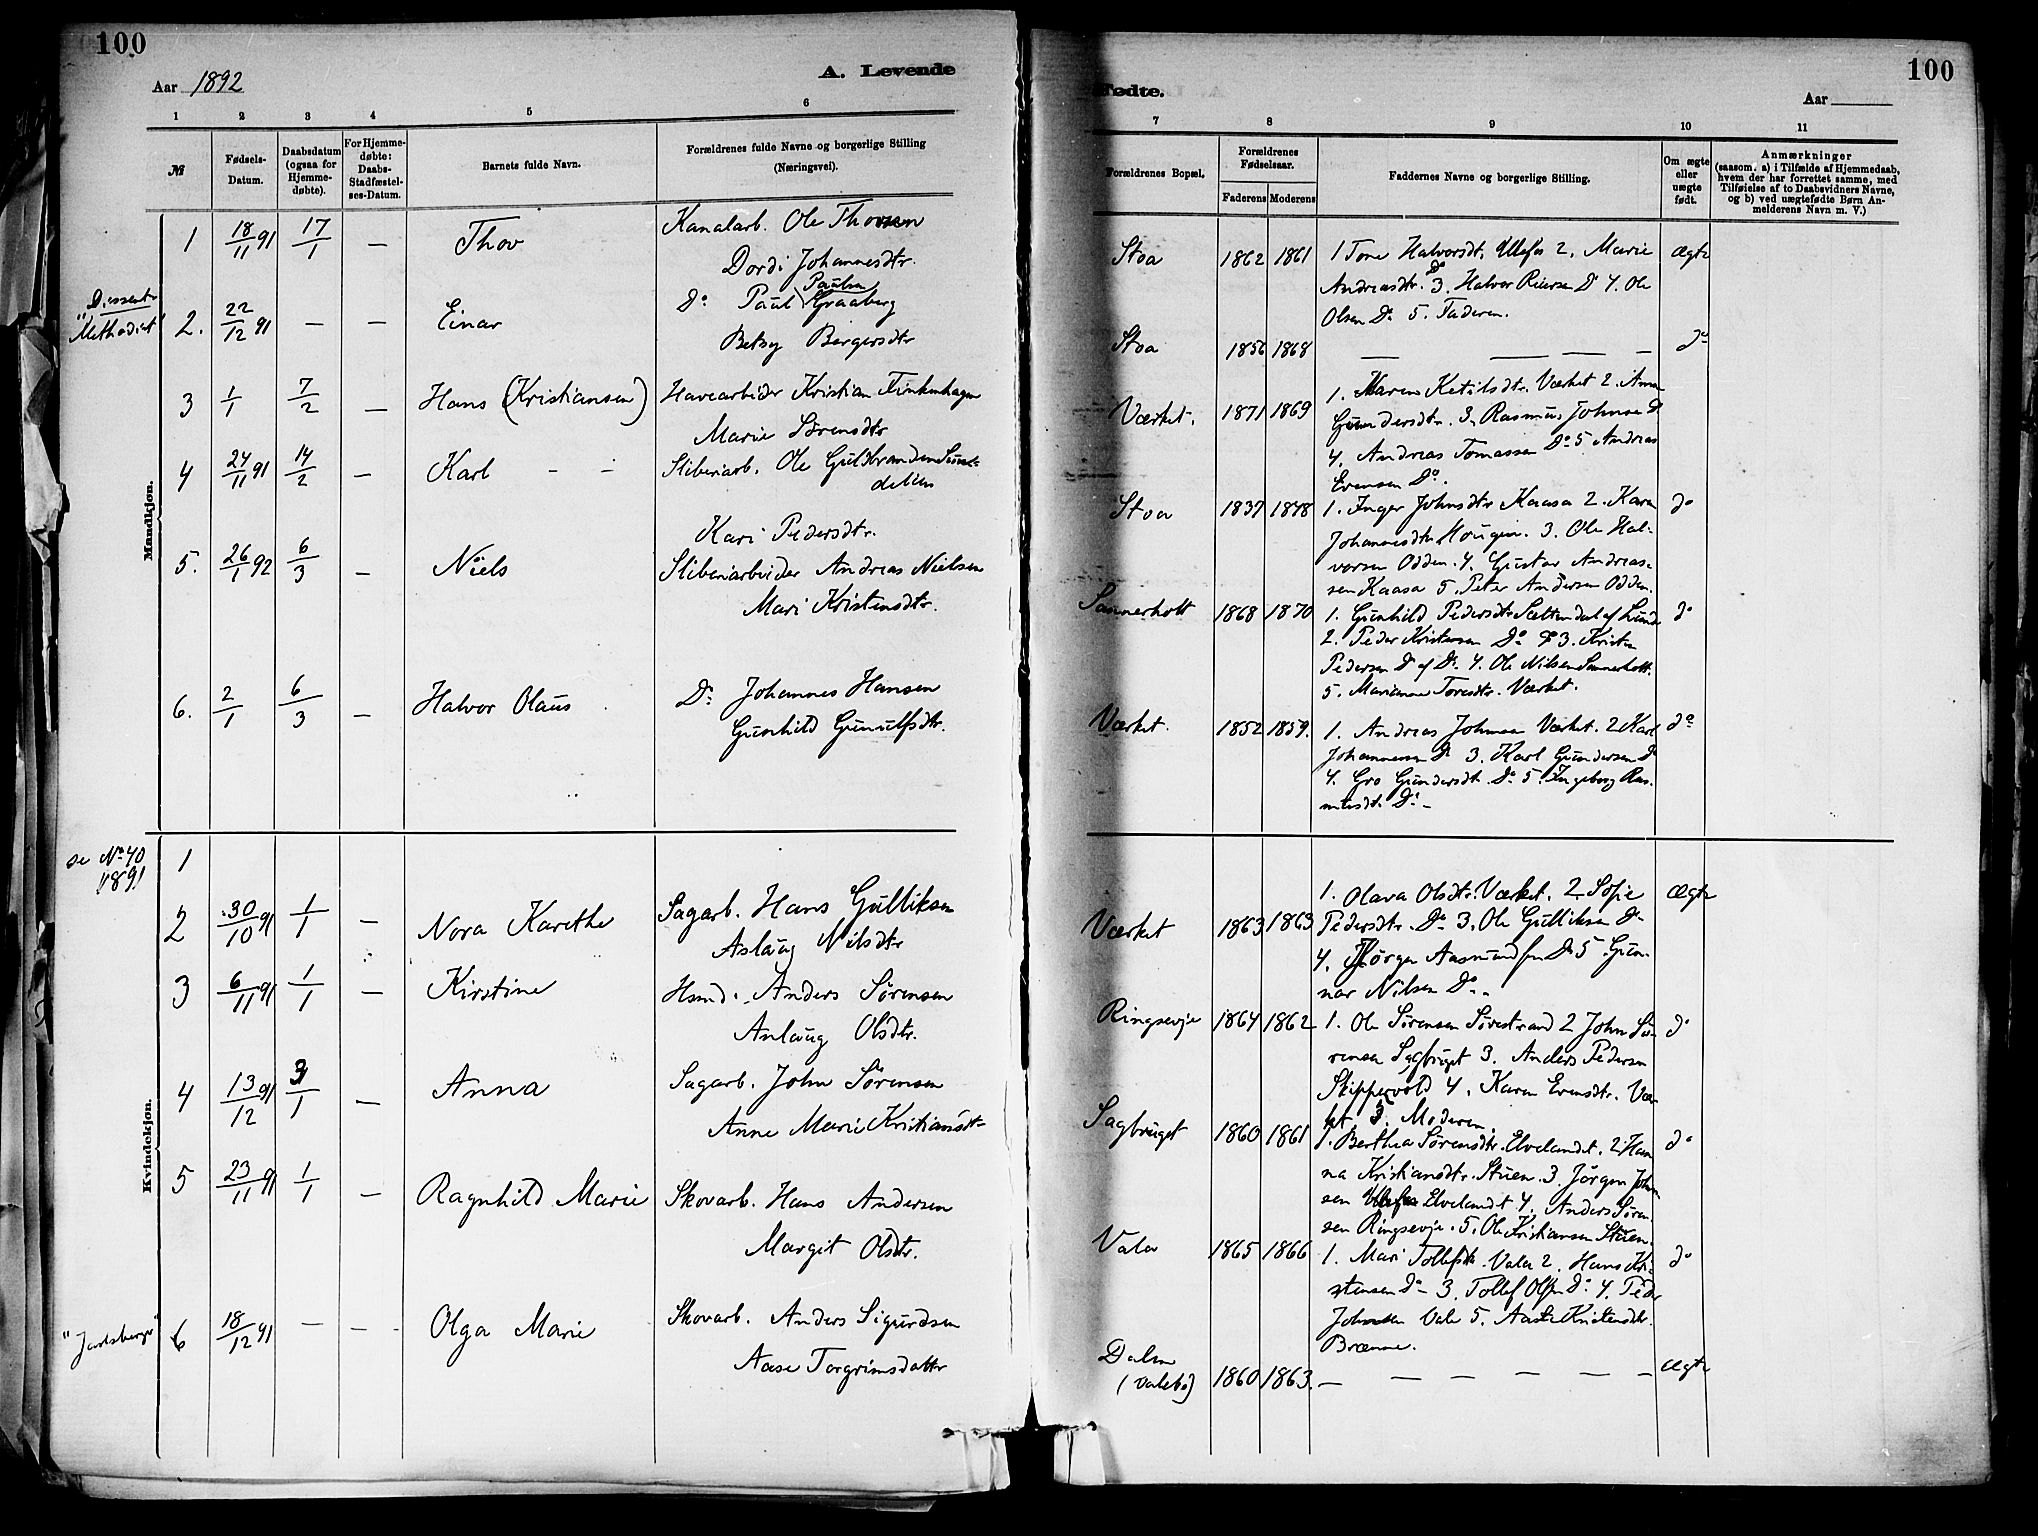 SAKO, Holla kirkebøker, F/Fa/L0008: Ministerialbok nr. 8, 1882-1897, s. 100